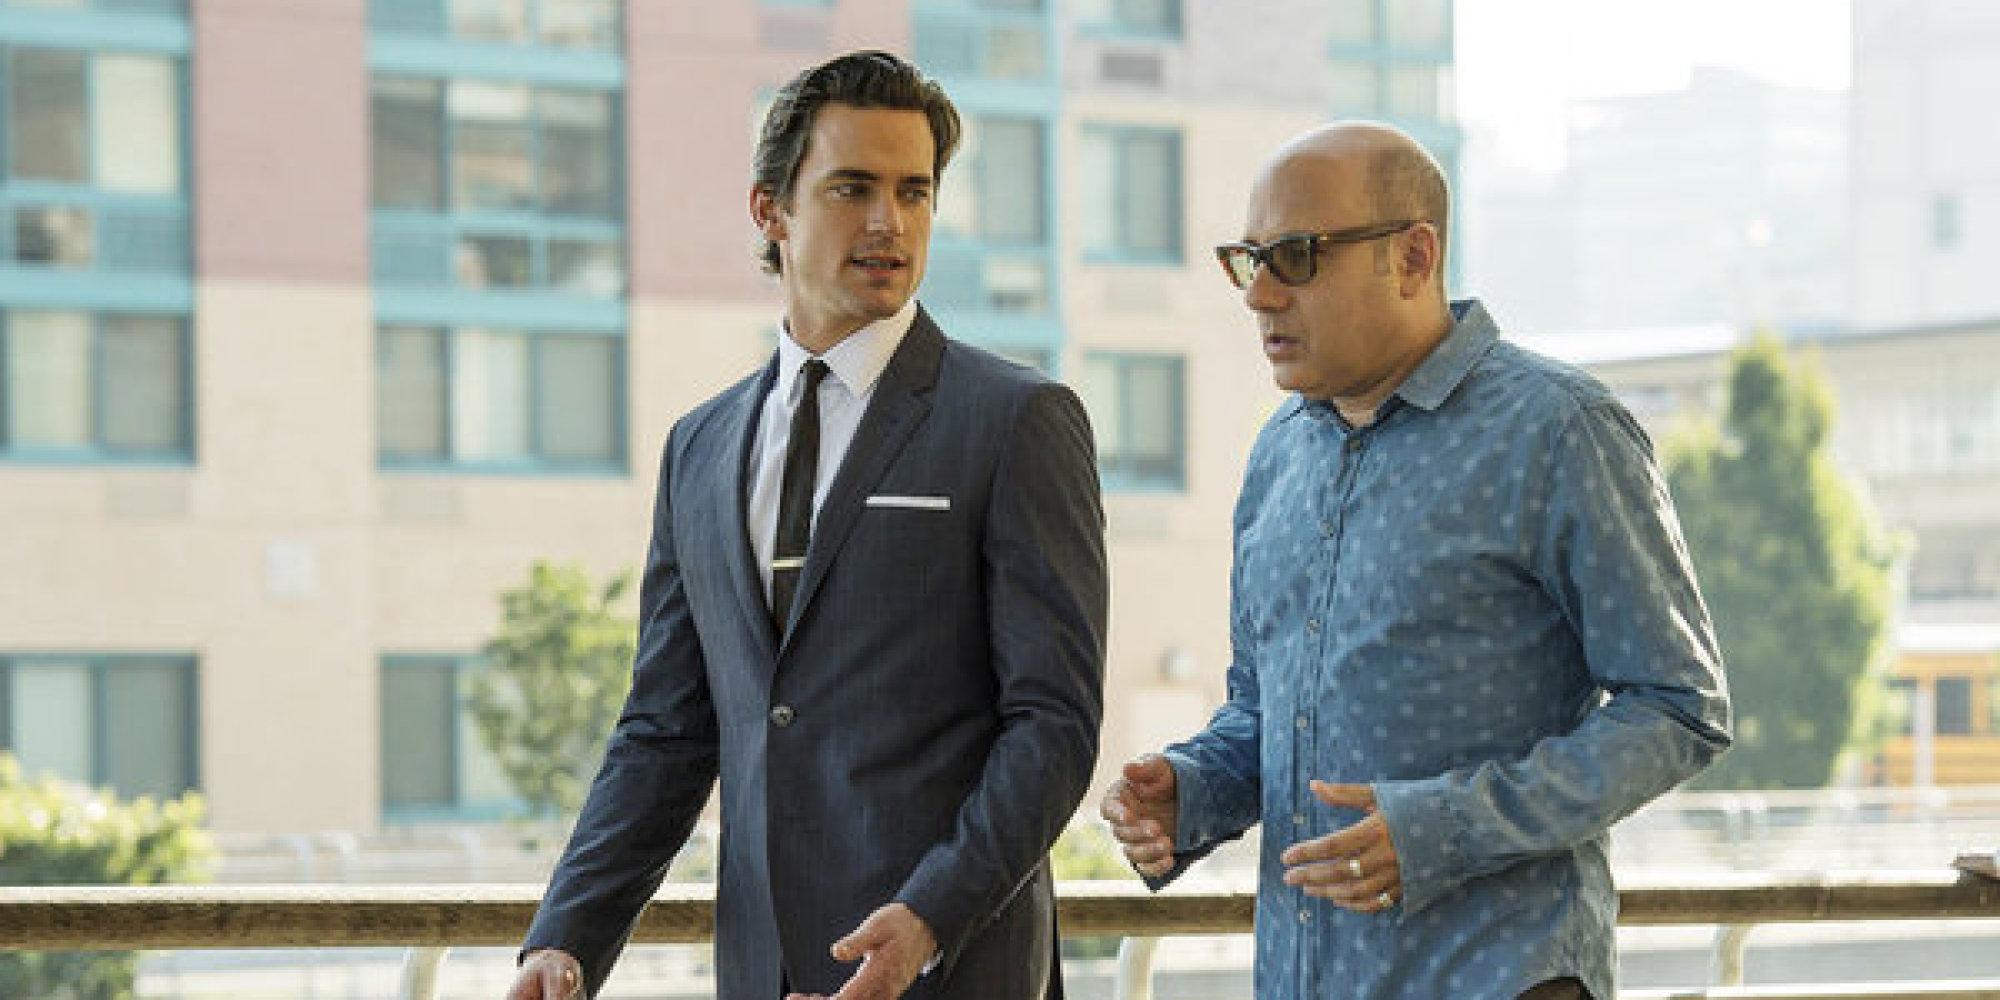 White Collar\' Season 5 Premiere Preview: Neal And Mozzie Scheme To ...